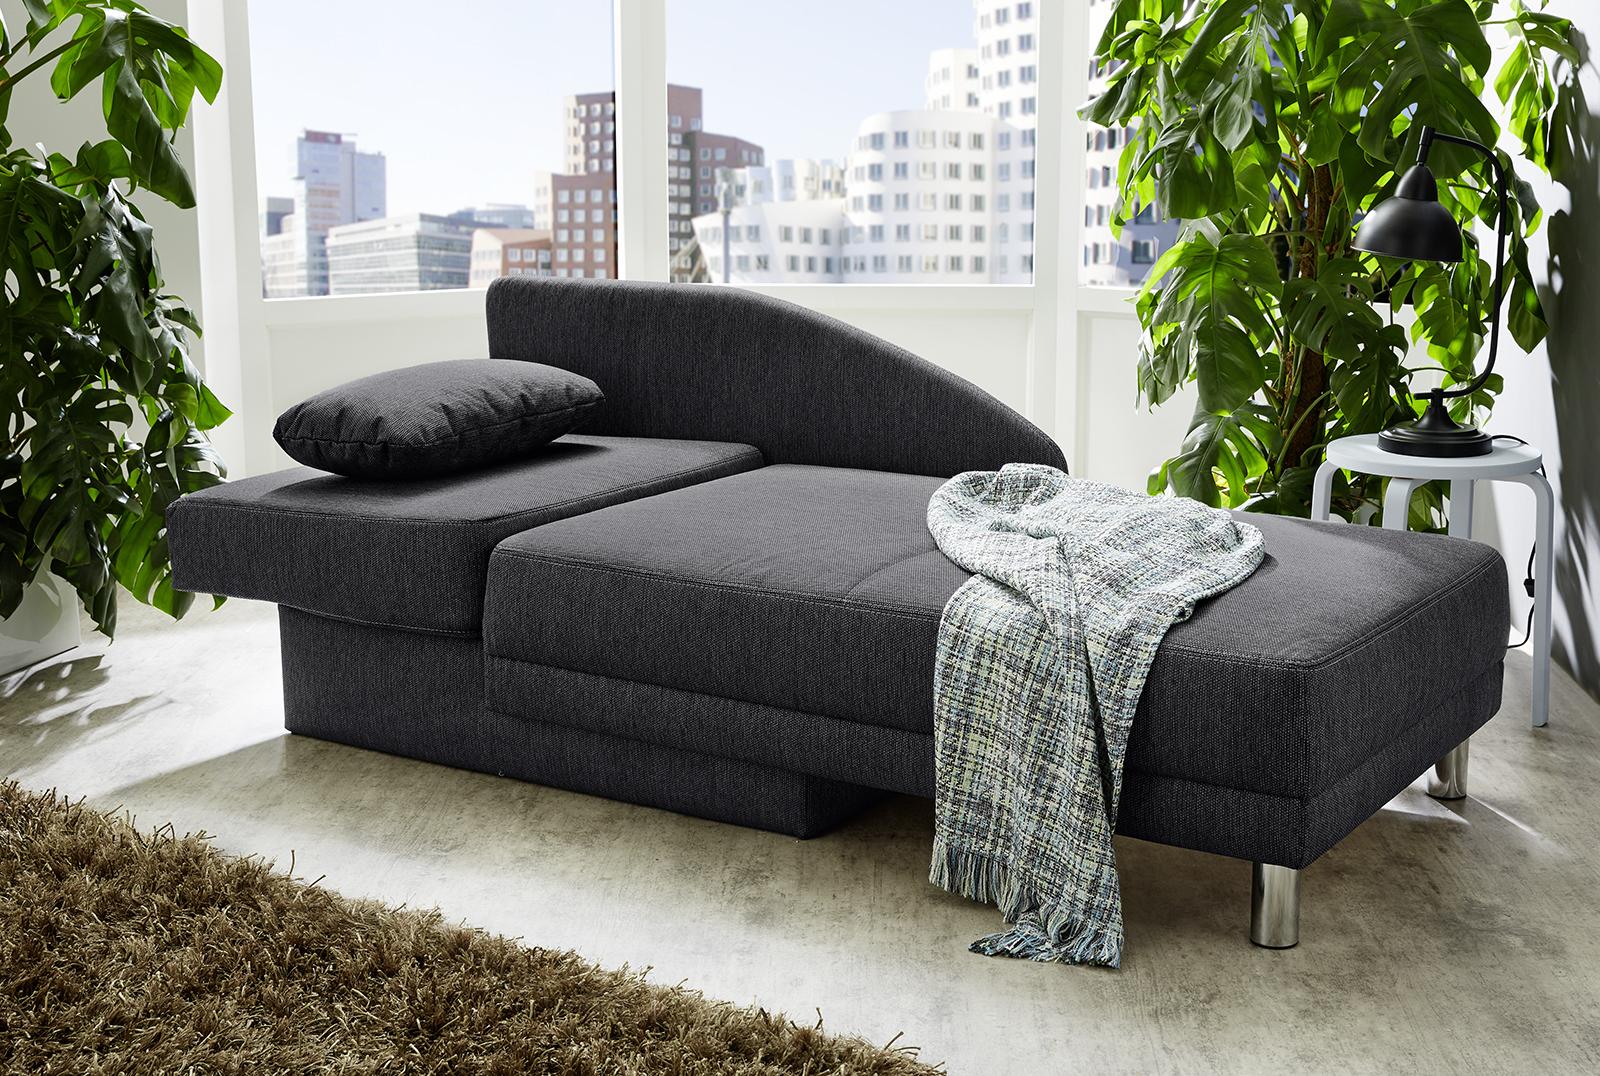 recamiere roy bettsofa inkl bettkasten. Black Bedroom Furniture Sets. Home Design Ideas